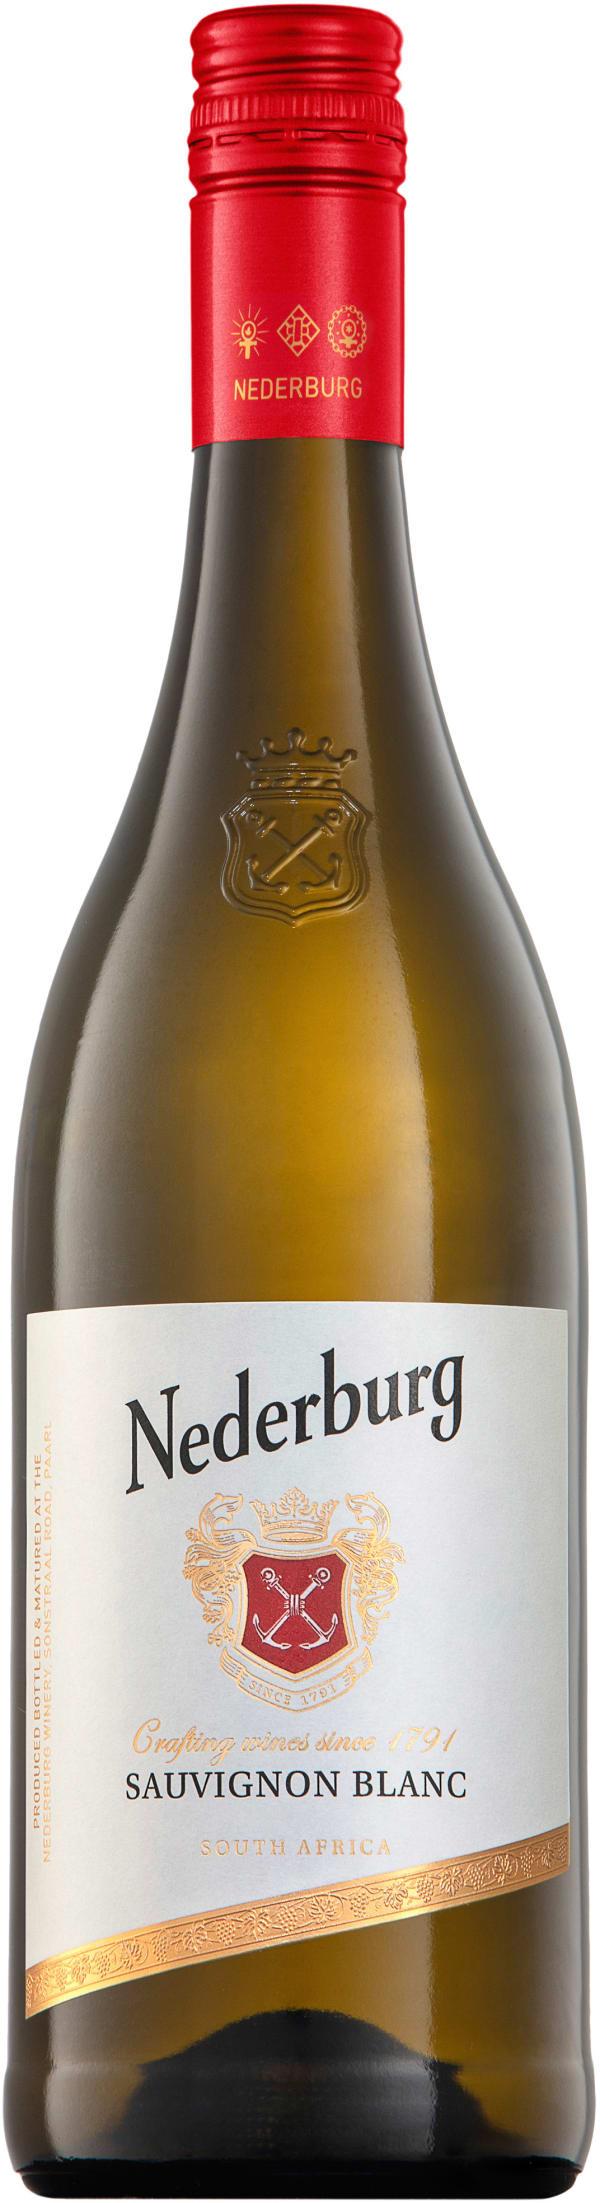 Nederburg The Winemasters Sauvignon Blanc 2018